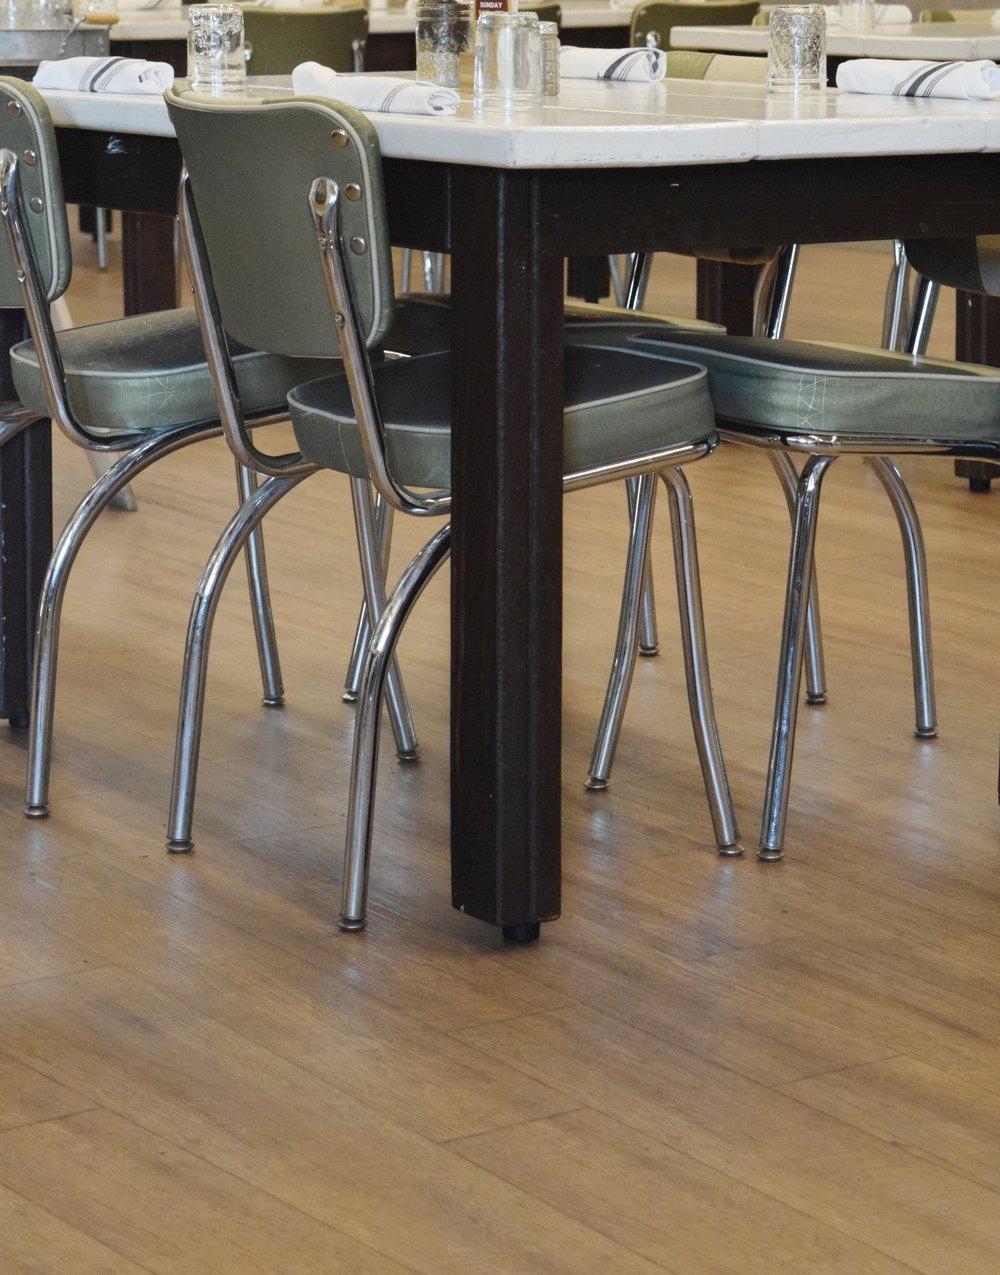 Mudhen interior decor and seating